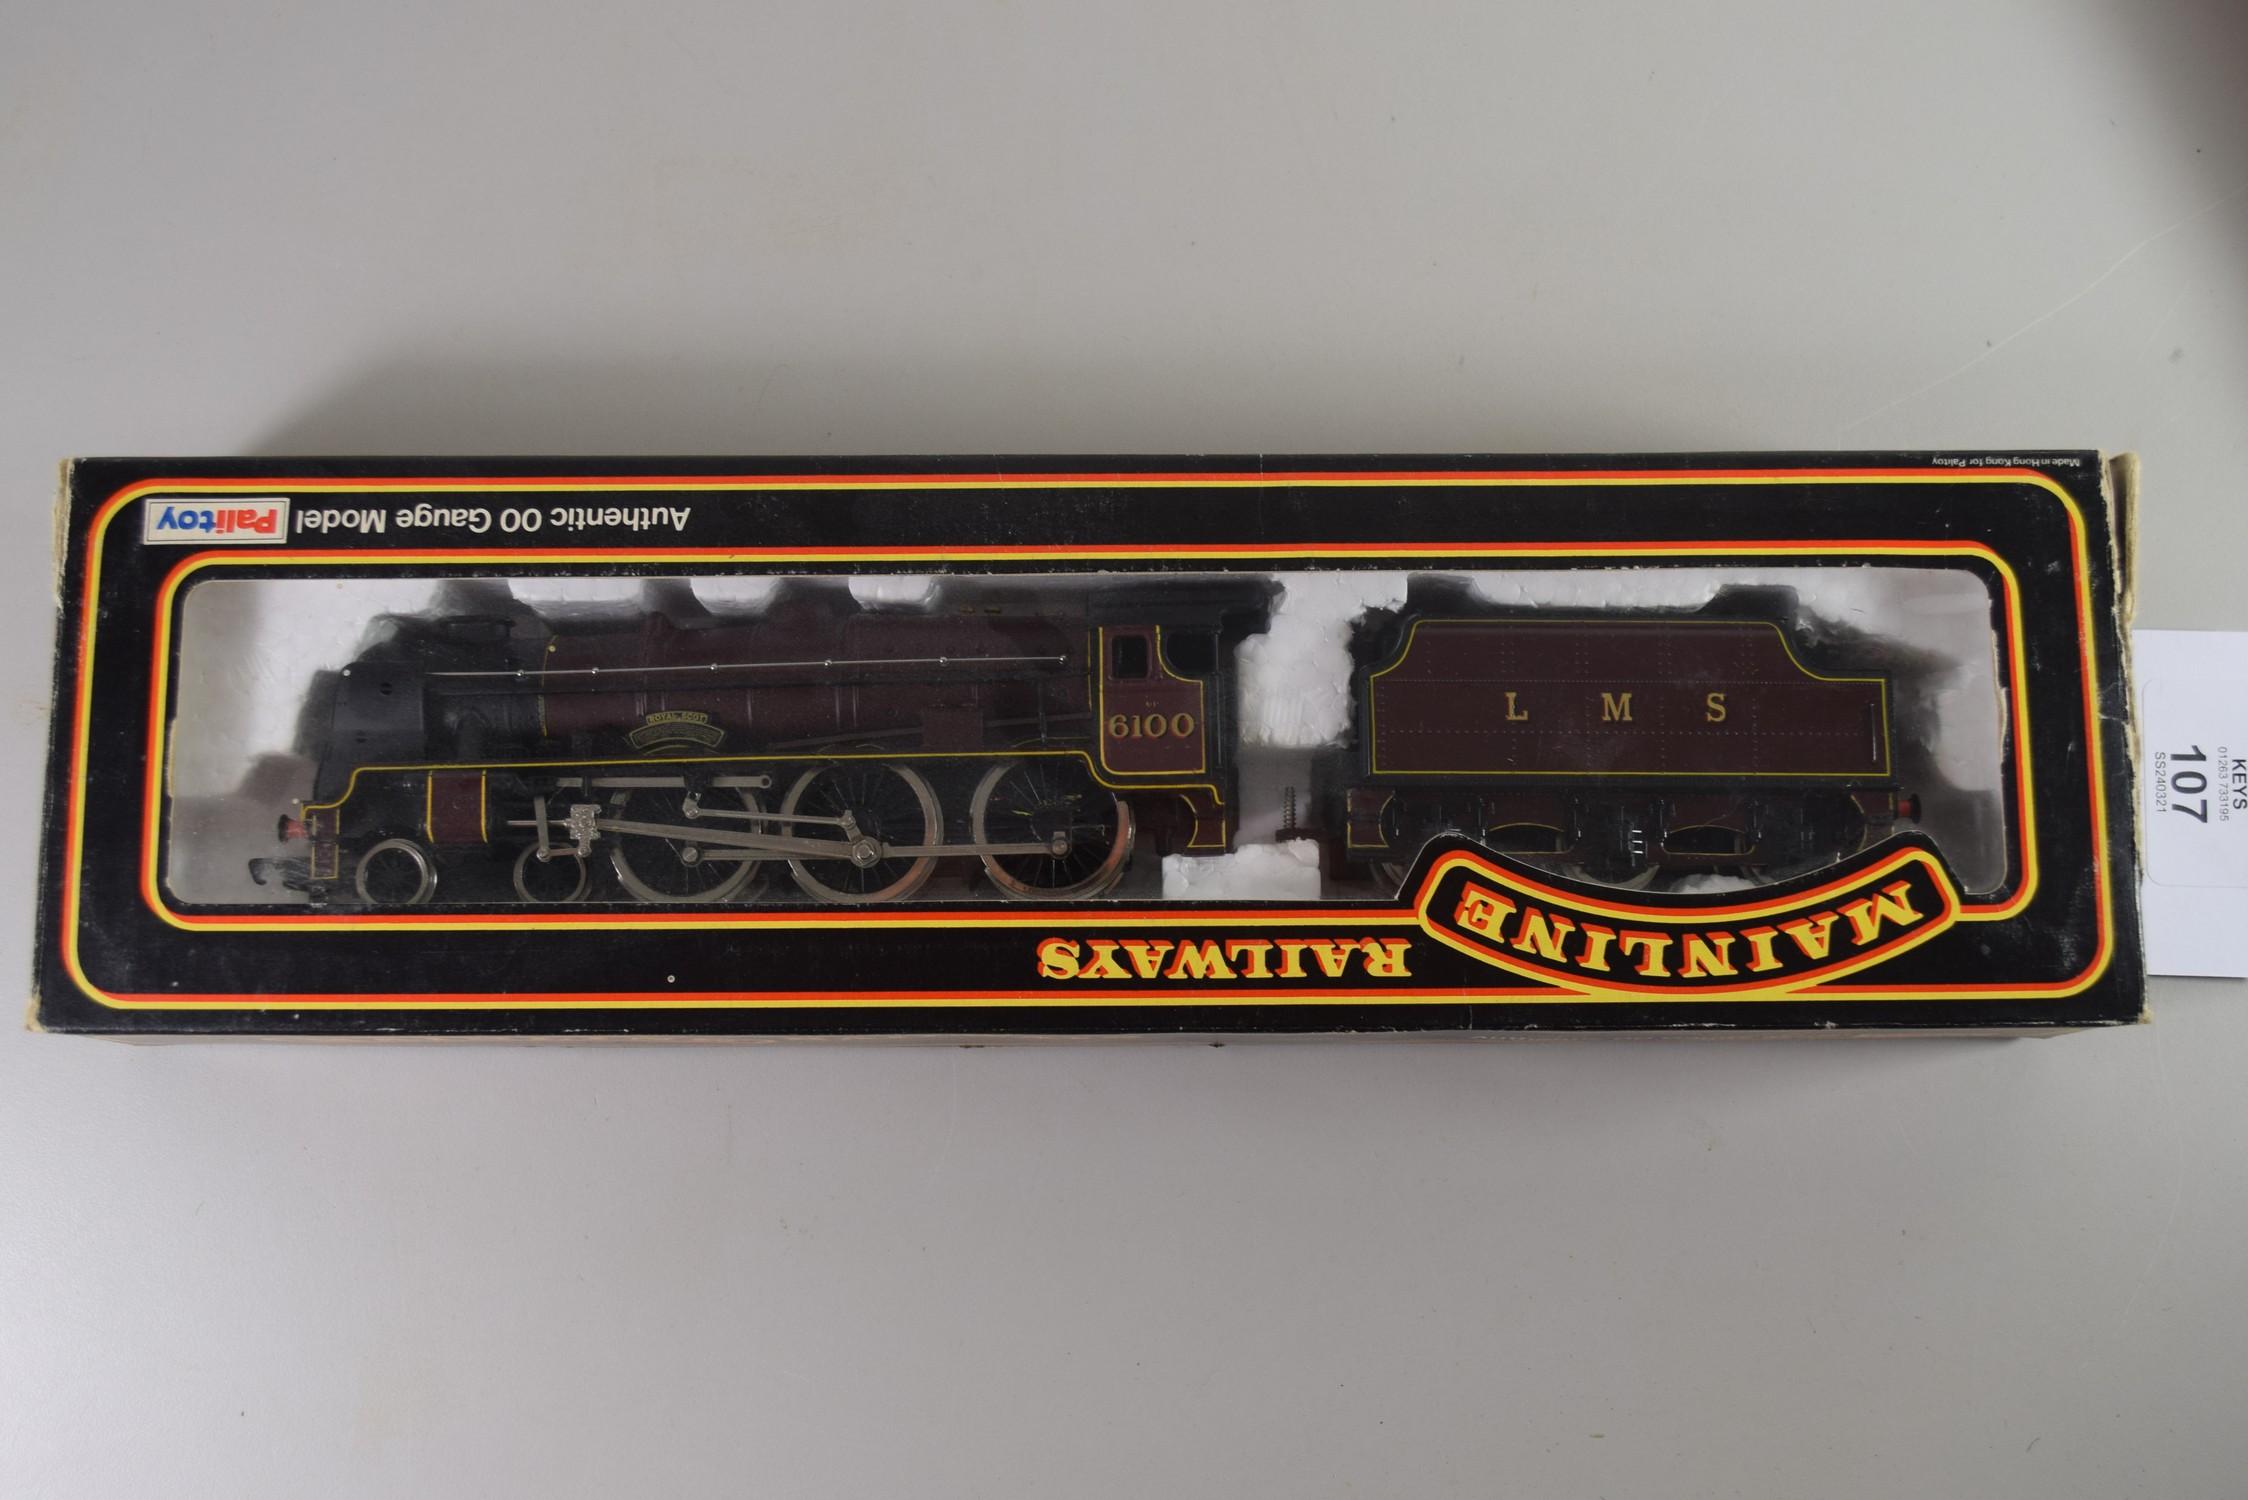 Boxed Mainline Railways 00 gauge Royal Scot locomotive No 6100 (non-associated box)